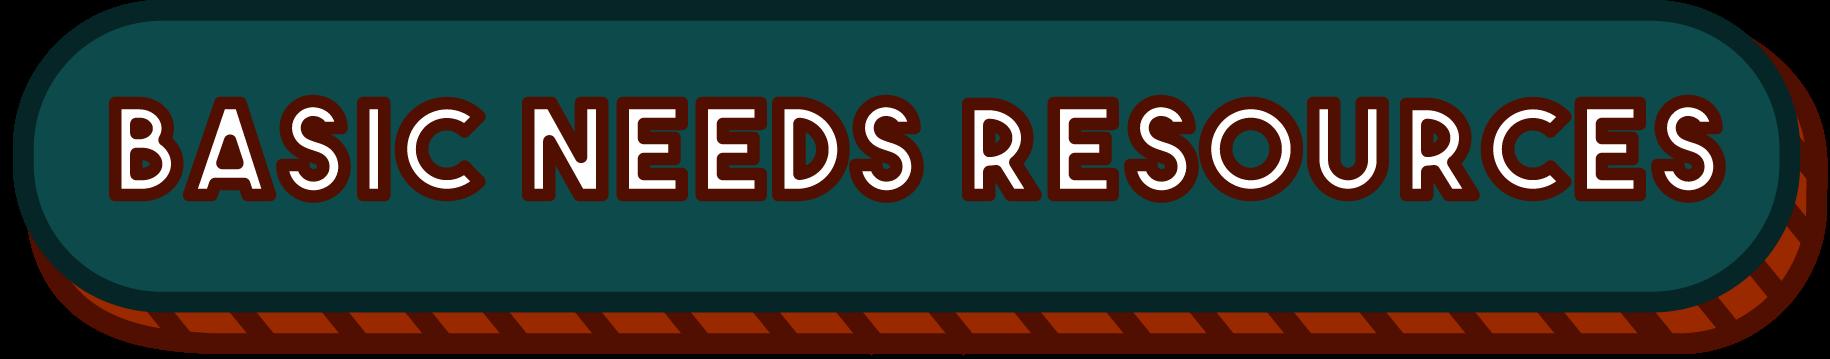 Basic Needs Resources